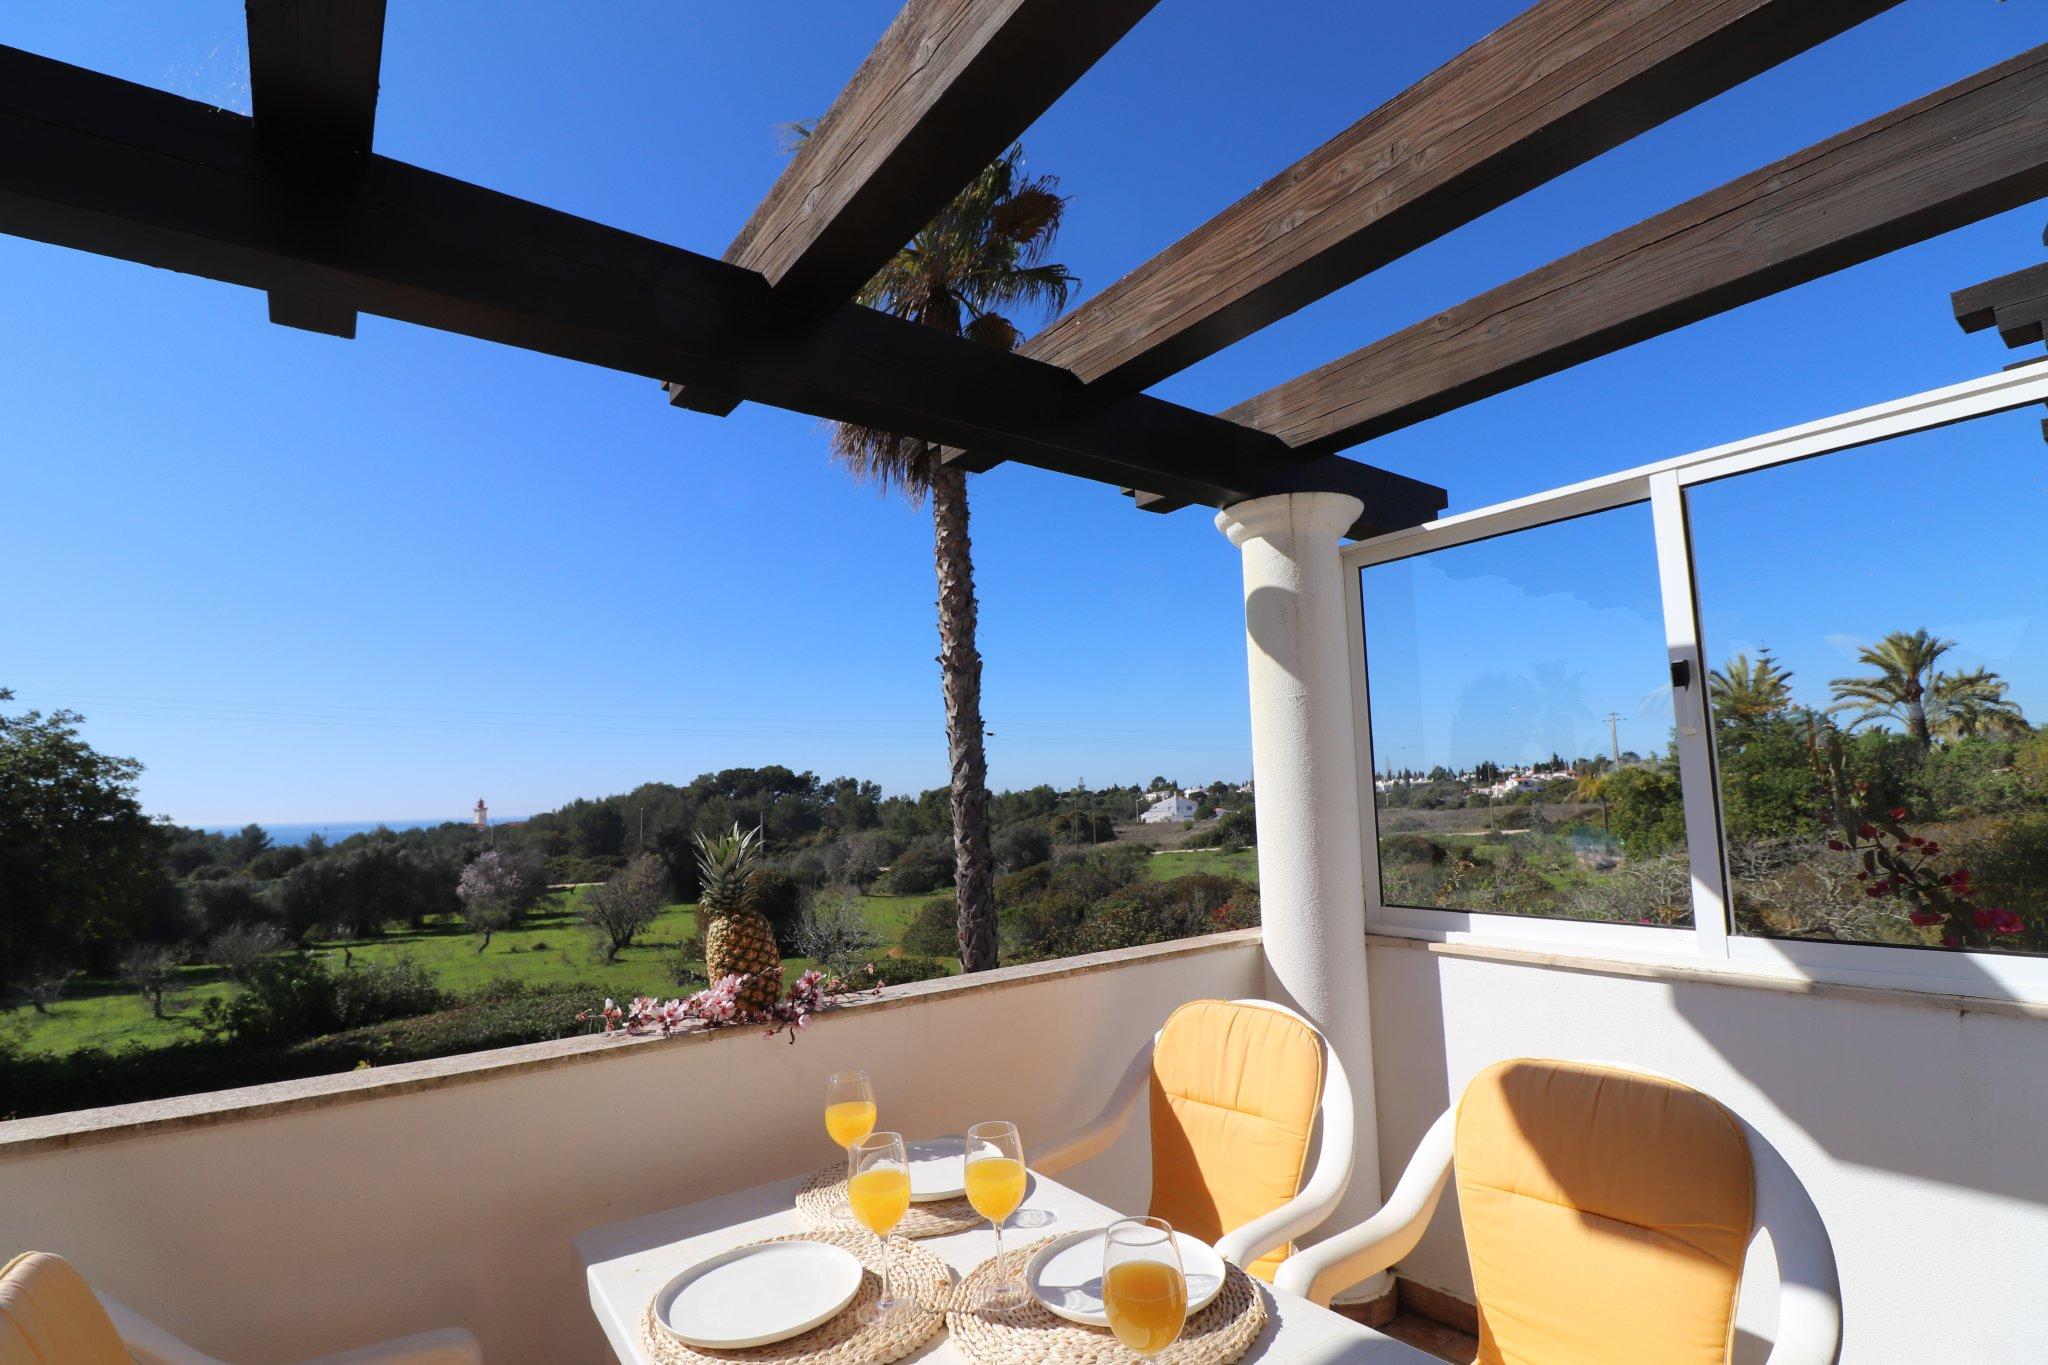 Casa atlantico in carvoeiro algarve elena laranjeira for Gartengestaltung kinderfreundlich